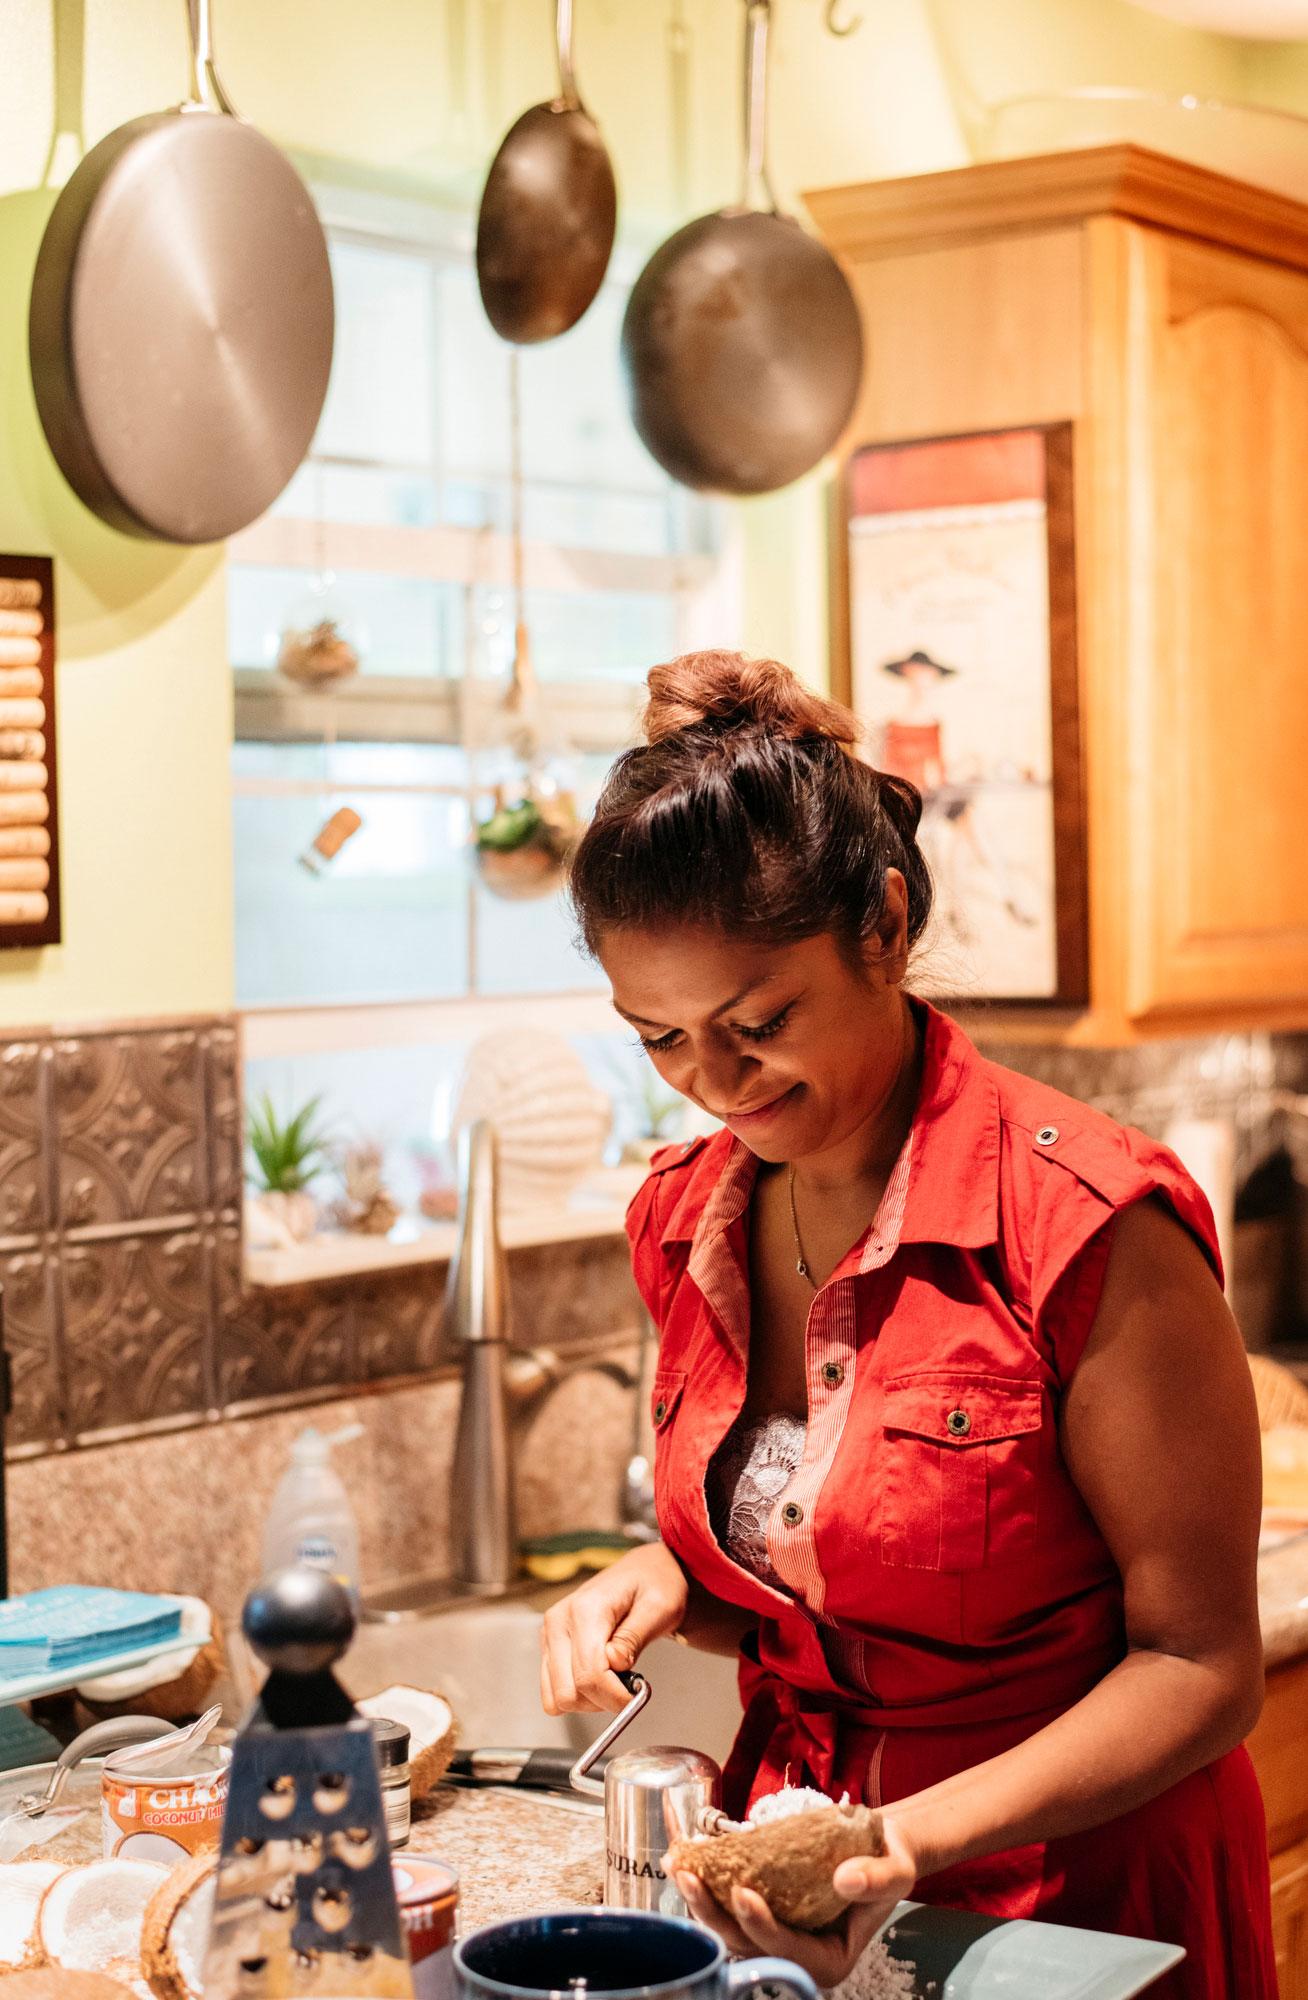 Los_Angeles_Food_photographer_Rebecca_Peloquin_Sri_Lankan_Food_013.JPG